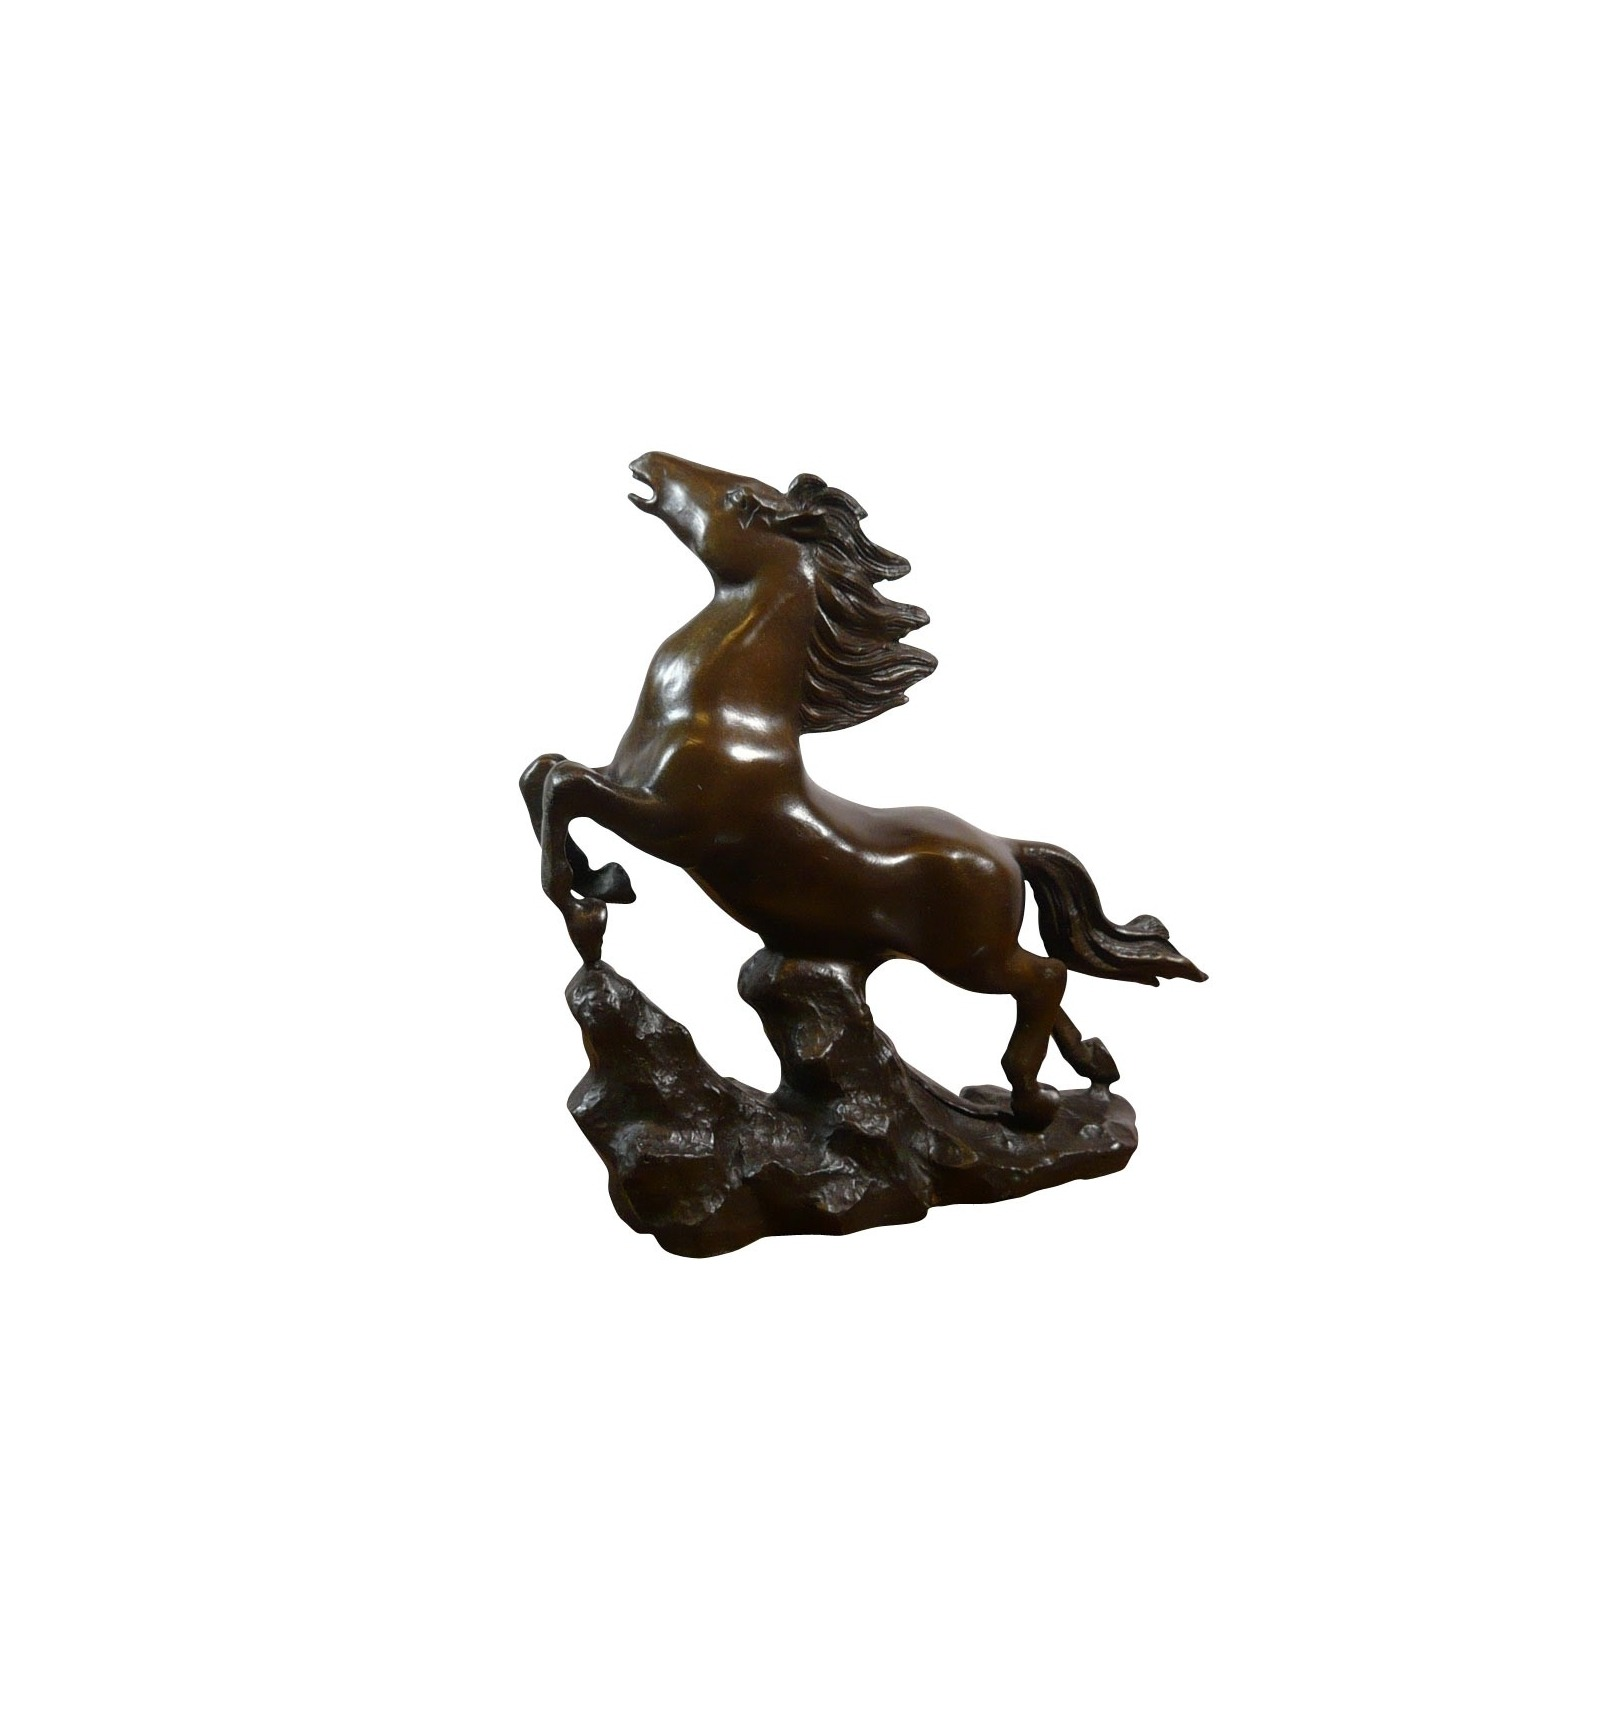 Bronze Sculpture Of A Horse Statue In Bronze Animal